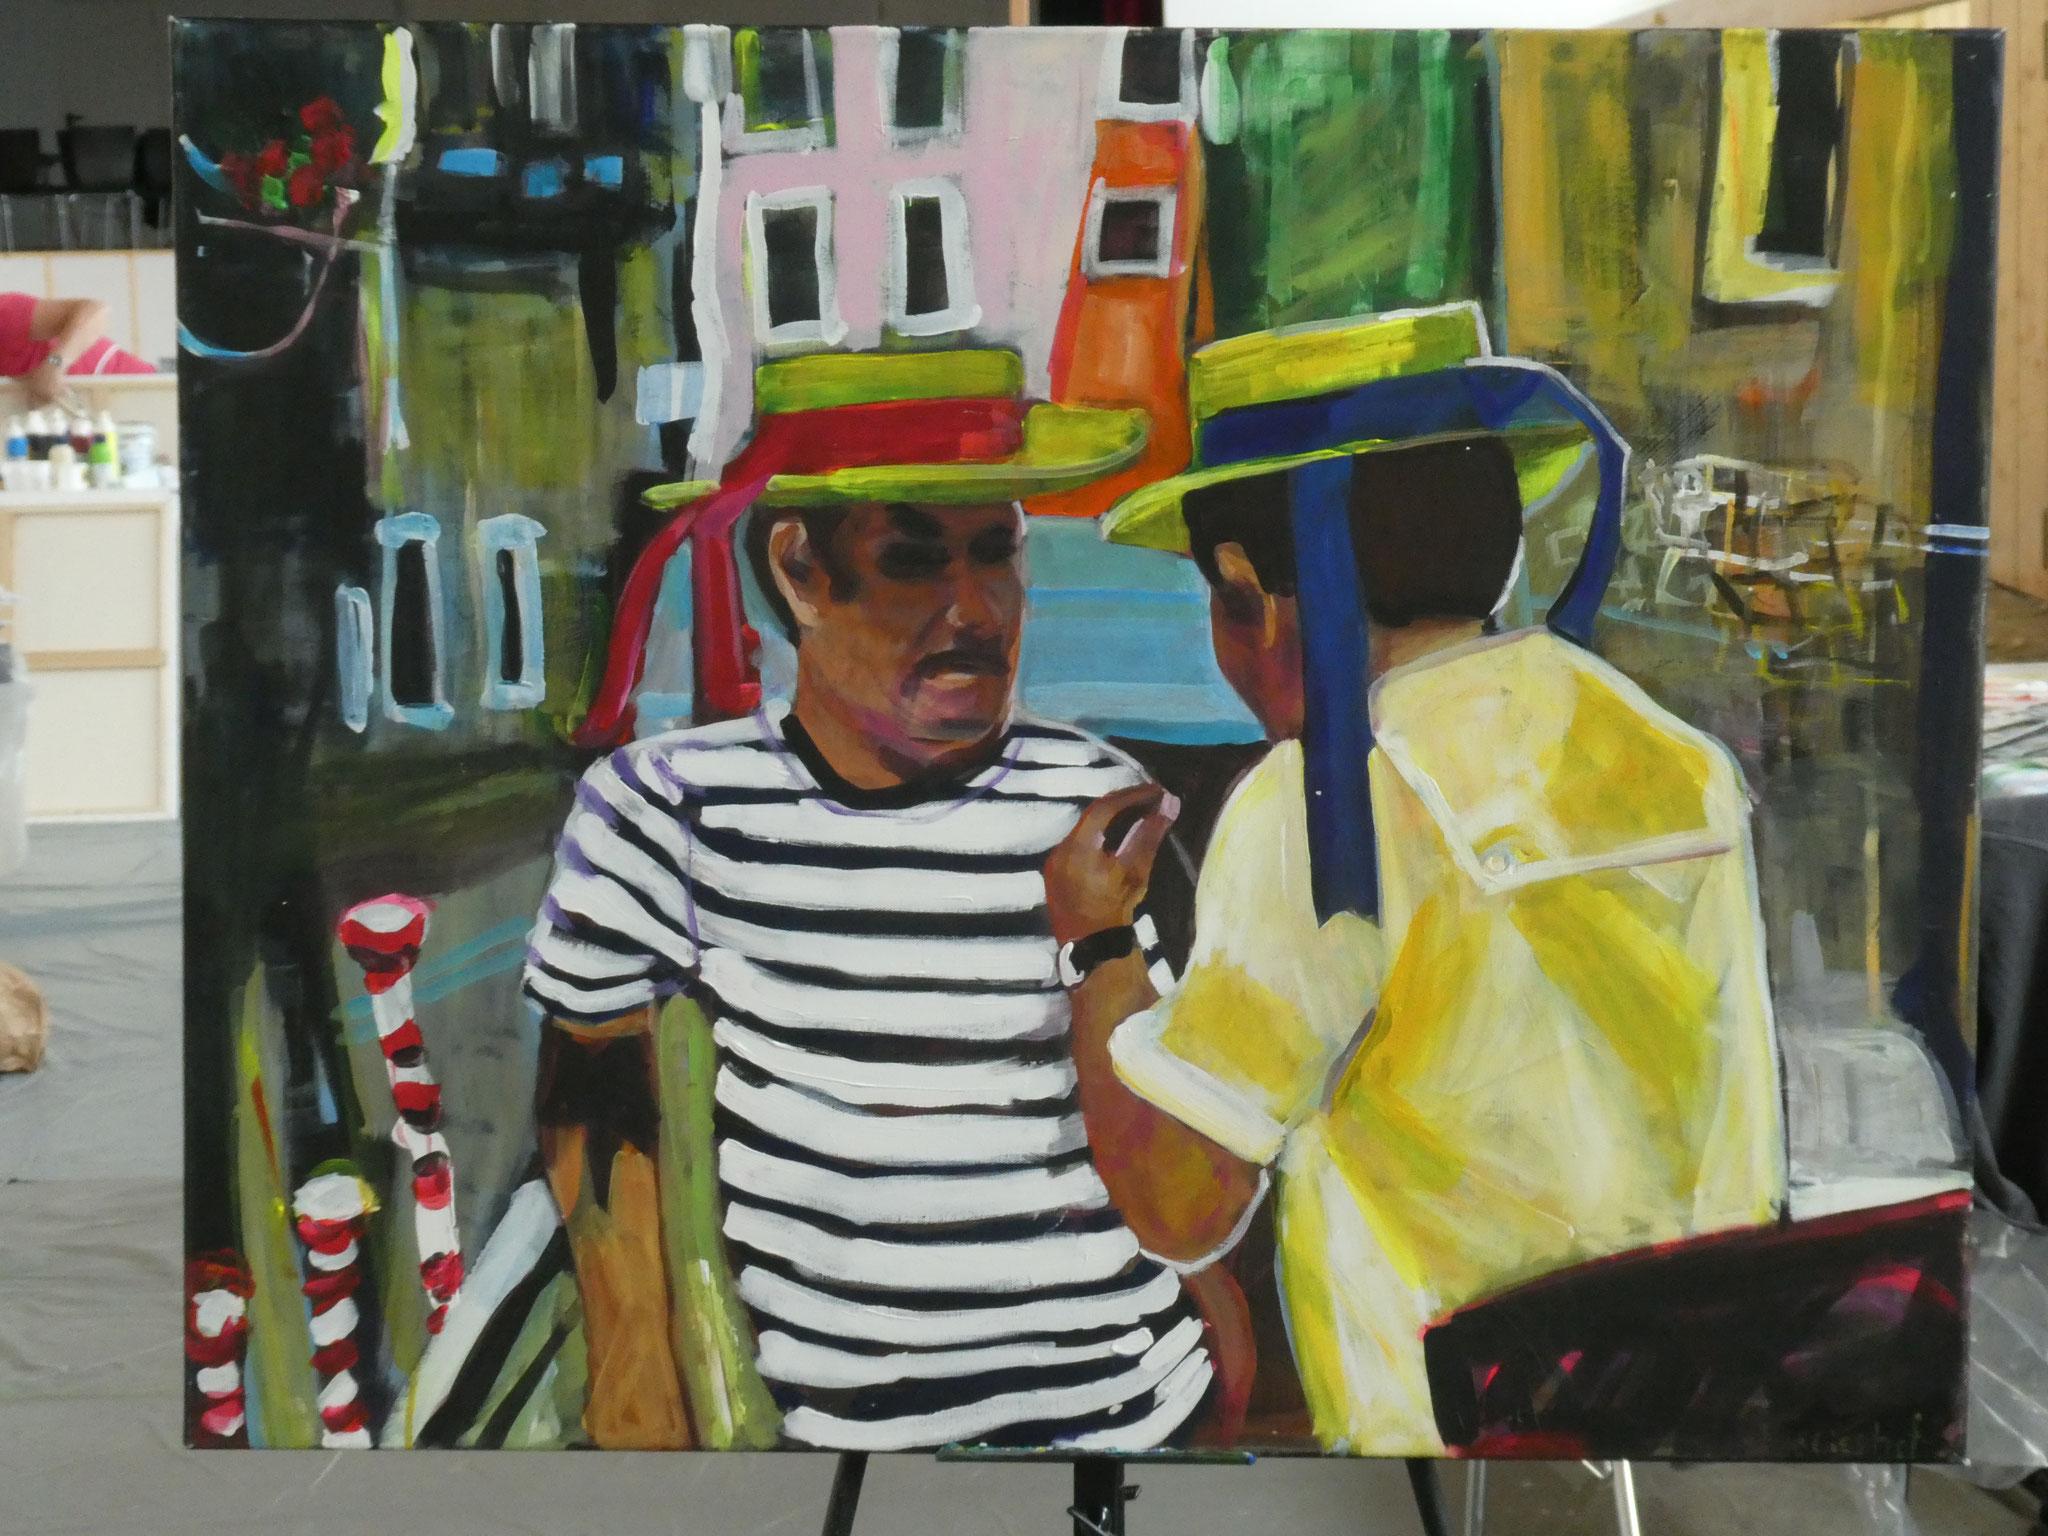 Auge in Auge: Venedig 1, 80x100, acrylic on canvas